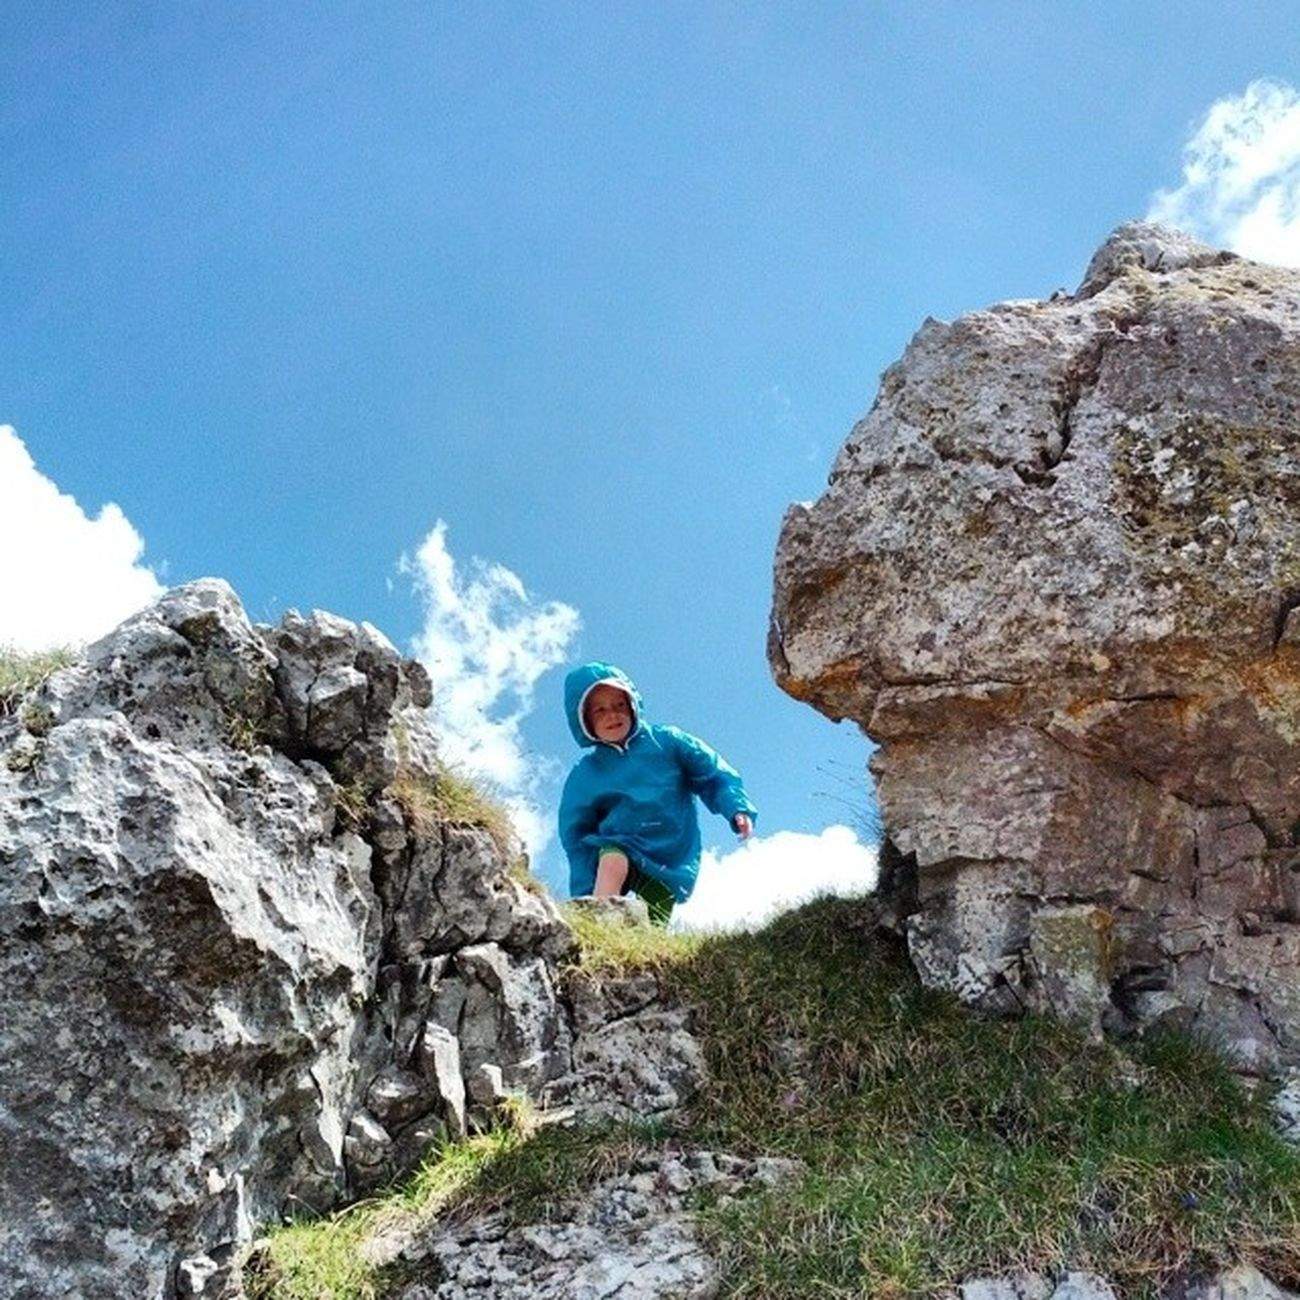 Tiziano betwen two rocks